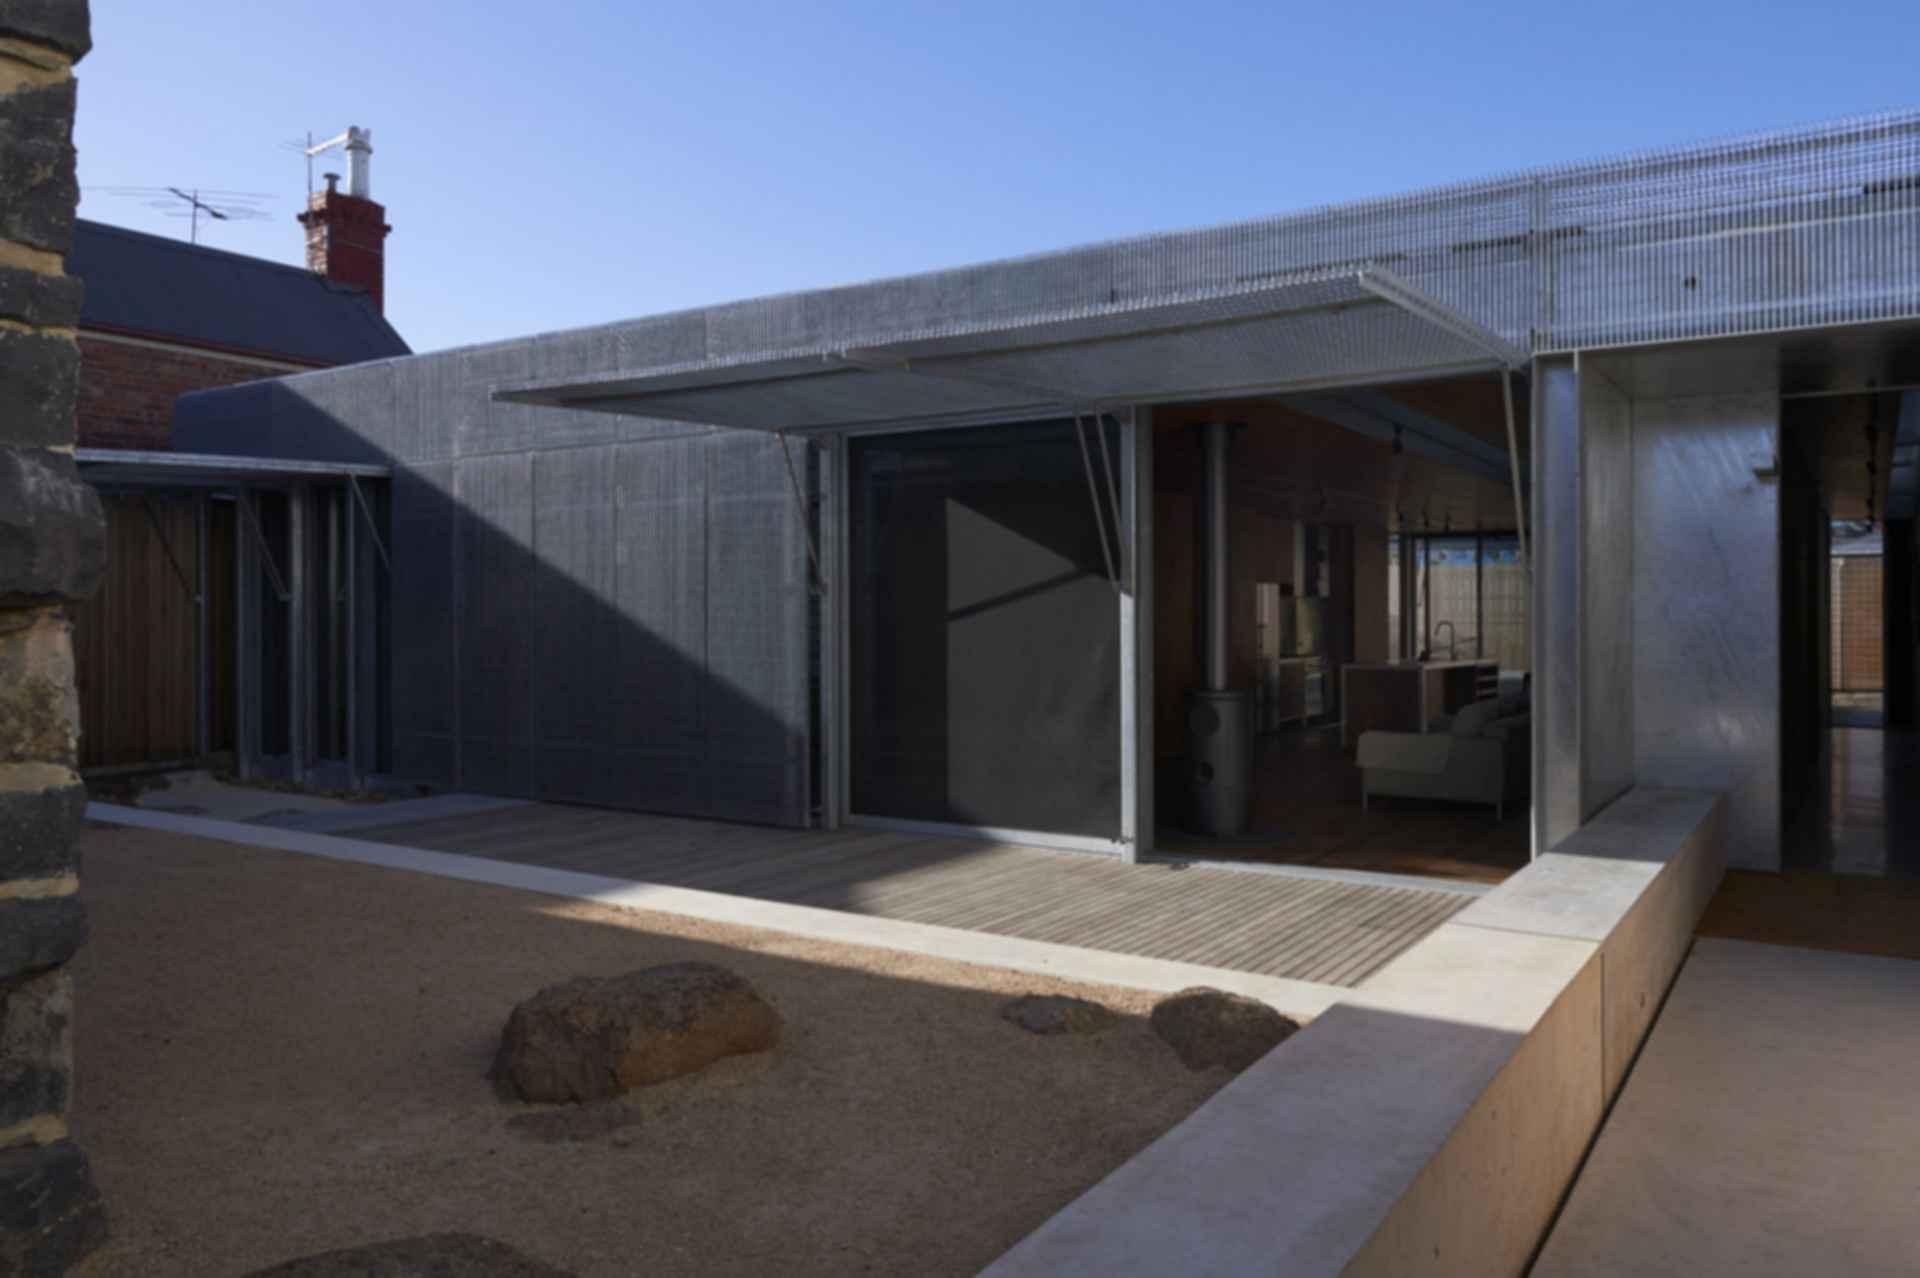 The Edward Street House - Exterior/Outdoor Area